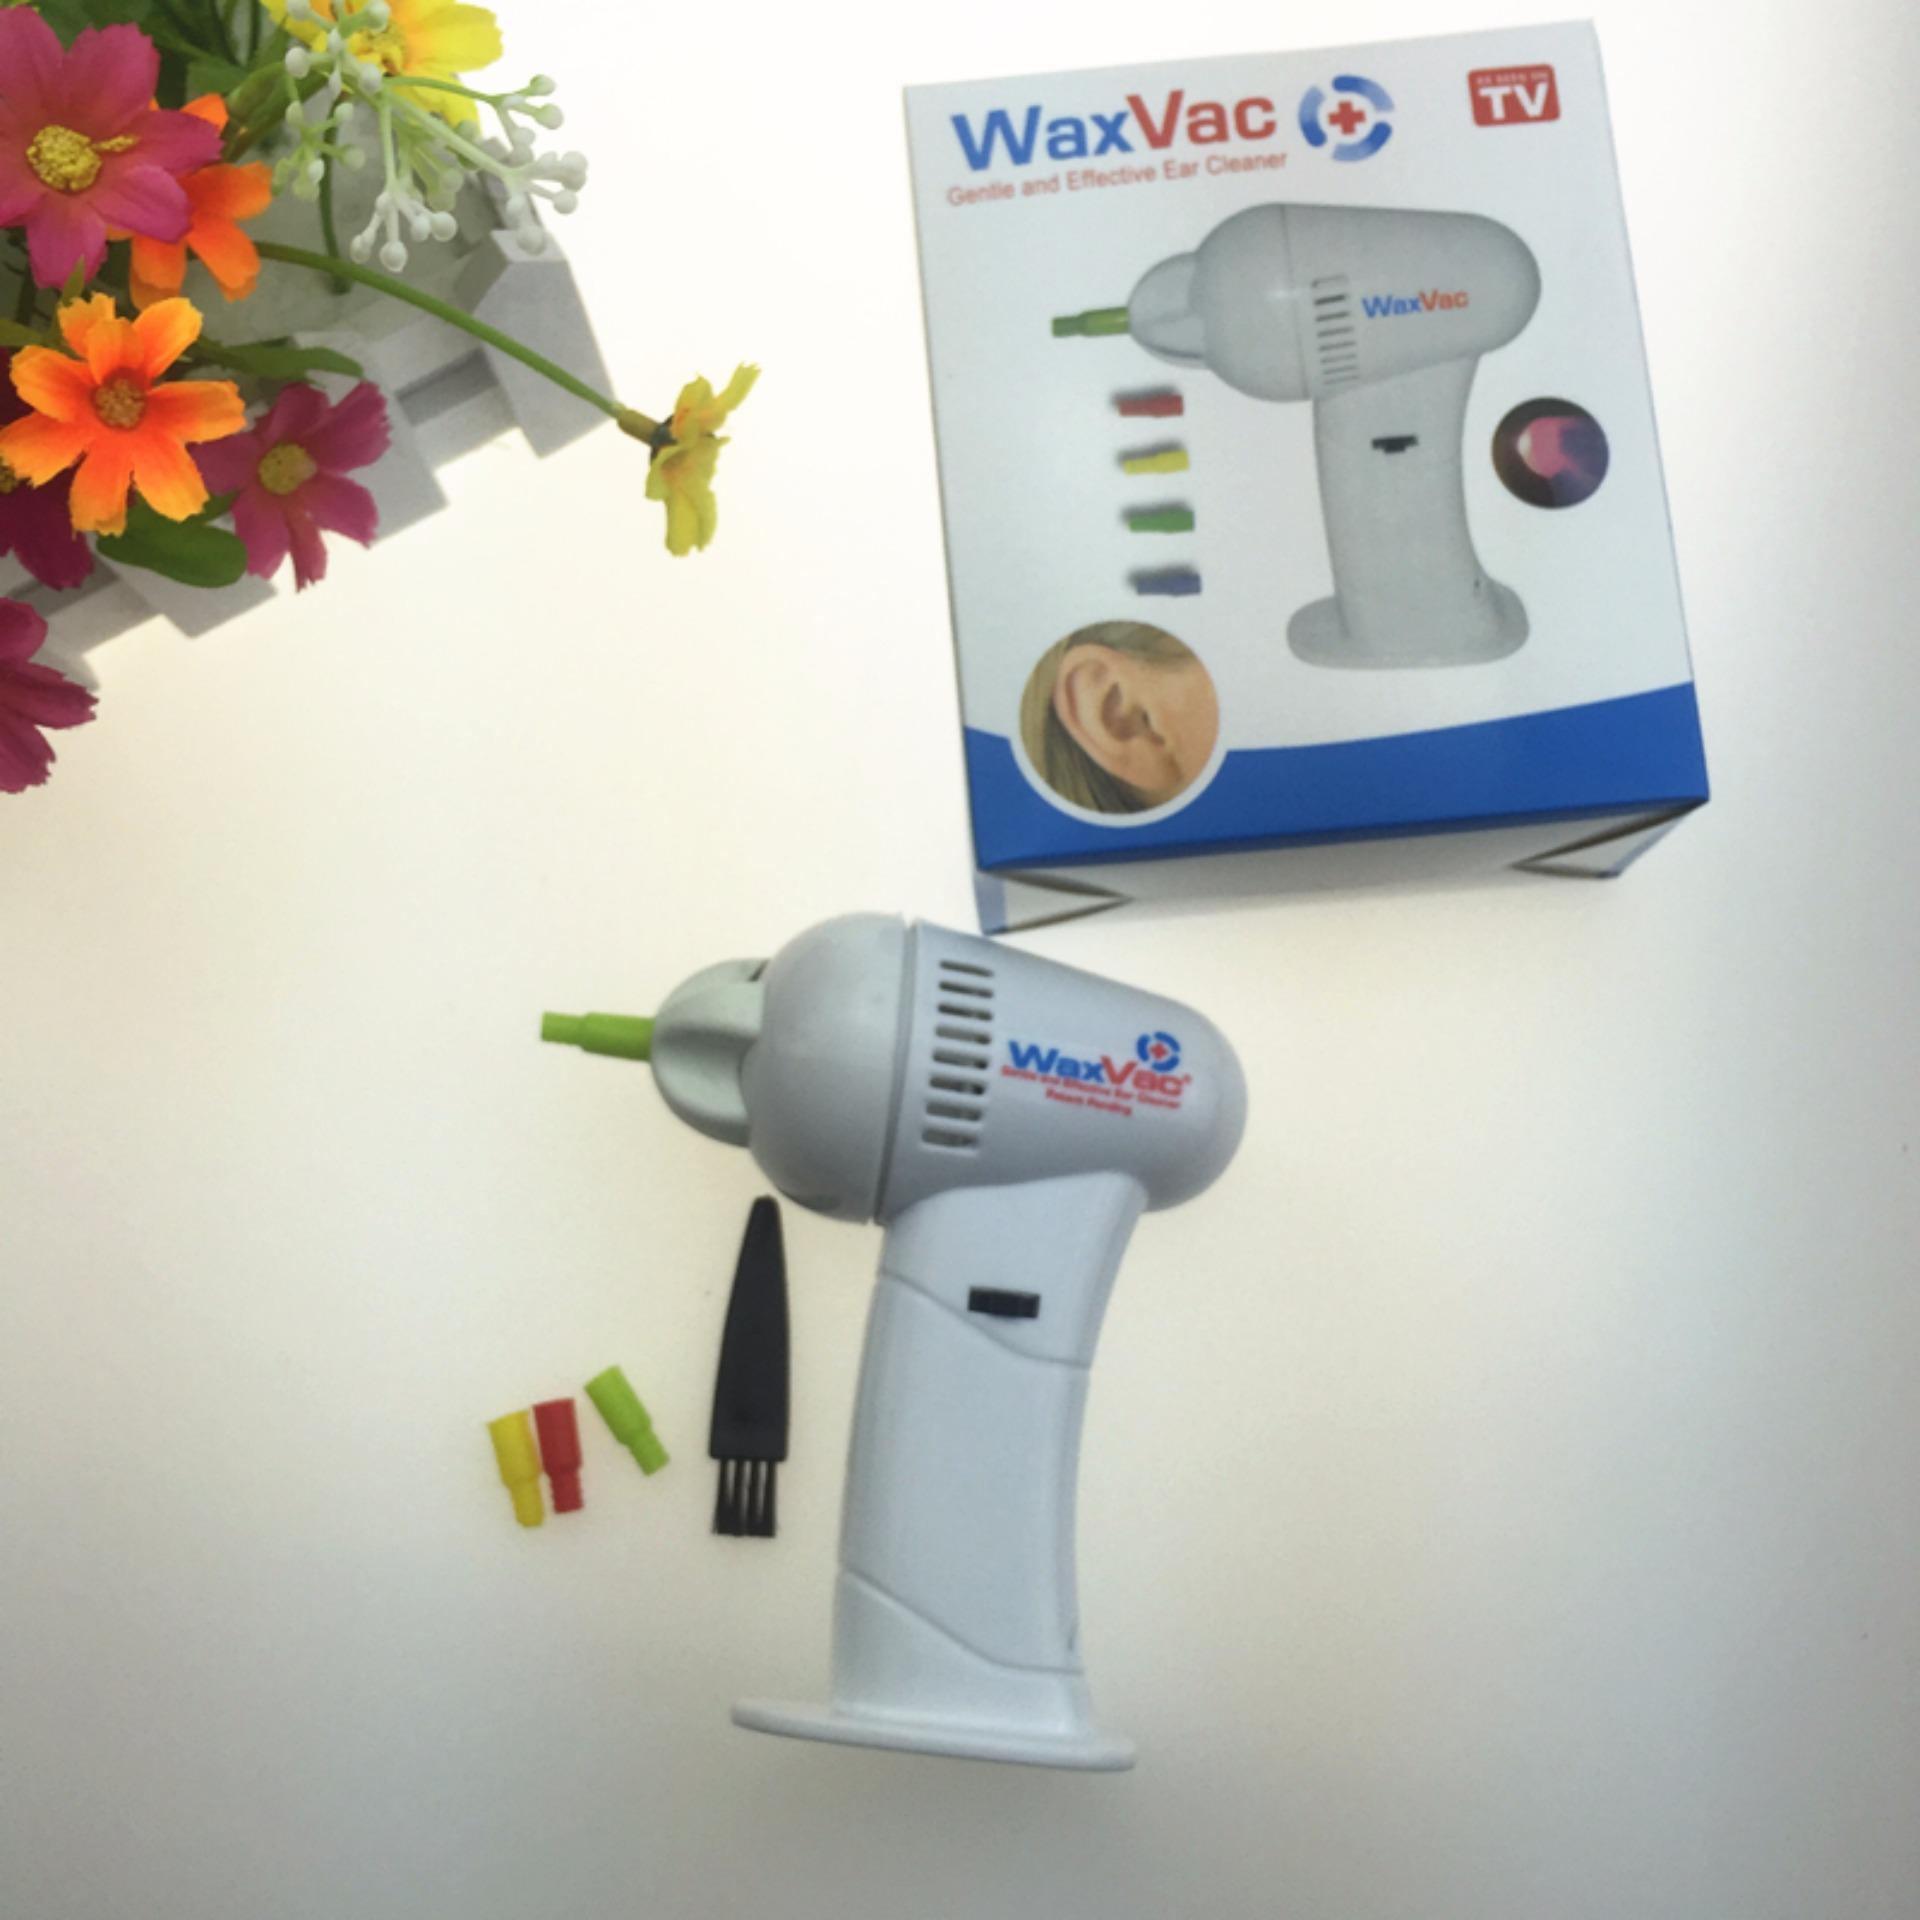 Alat Kesehatan Telinga Waxvac Pembersih Include Baterai Wax Vac Ear Vacuum Wvc Gentle And Effective Cleaner Elt 22 Jual Produk Terbaik Termurah Lazada Co Id Source